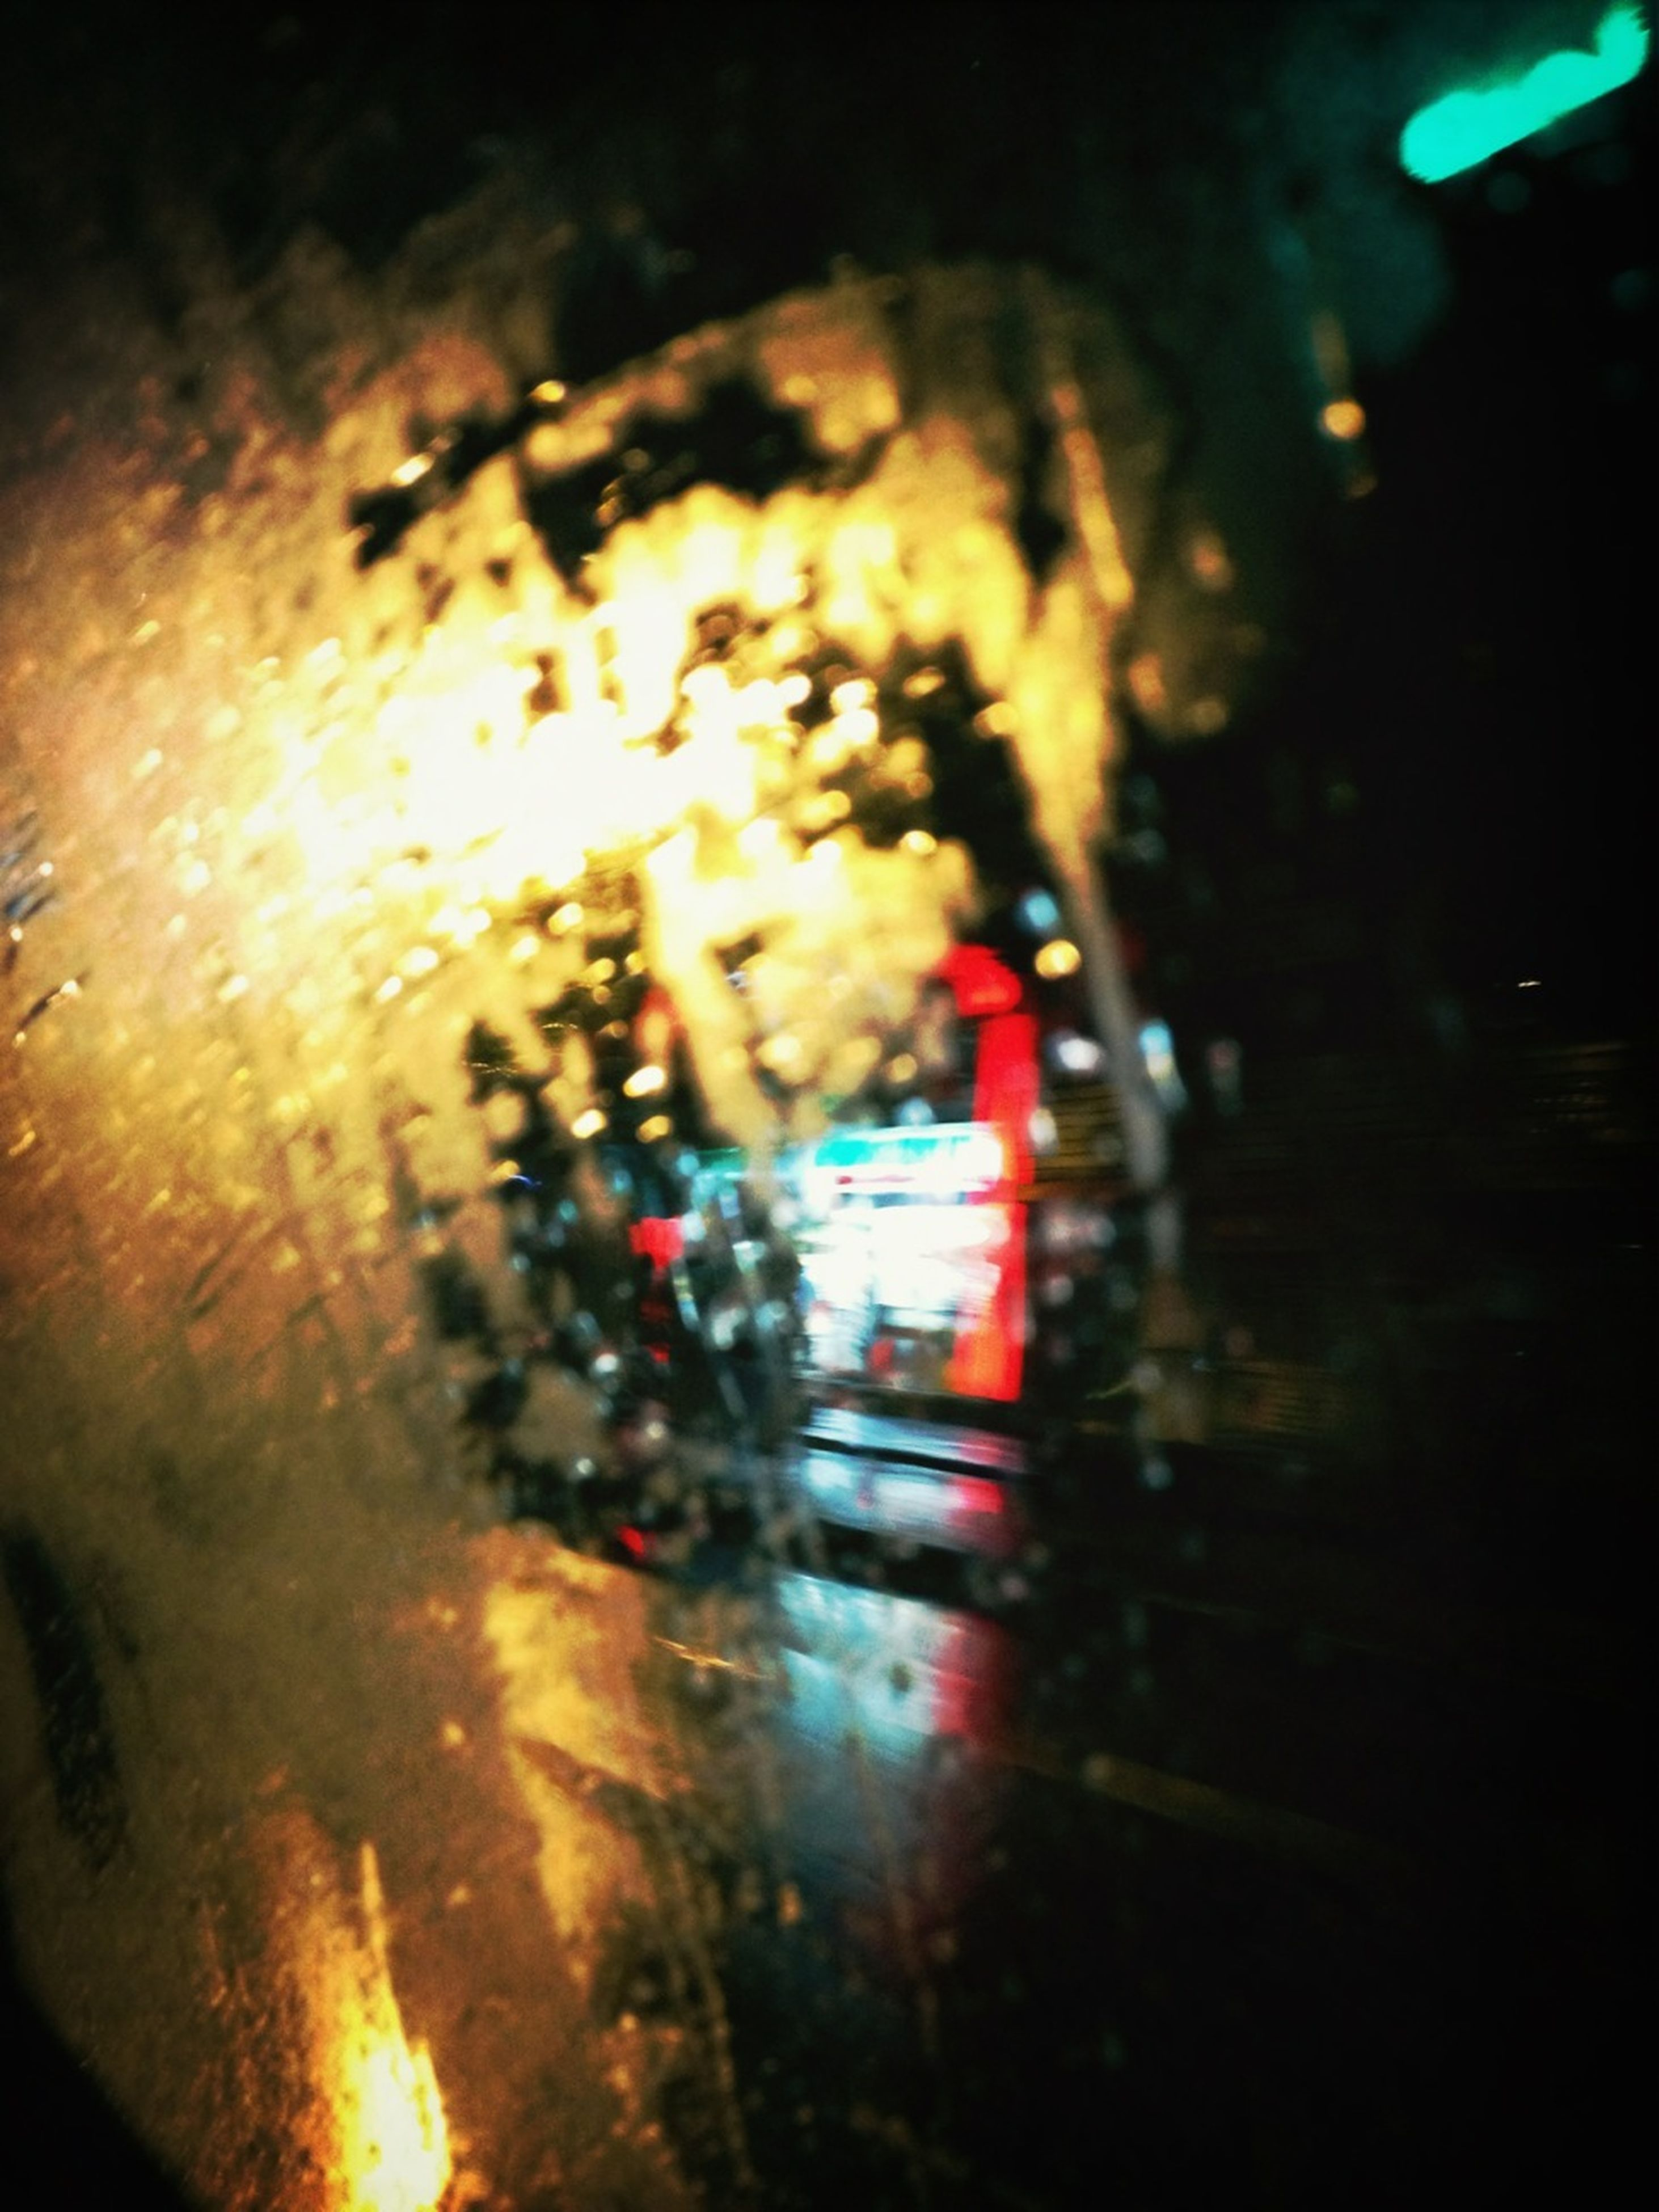 night, illuminated, transportation, land vehicle, indoors, mode of transport, car, wet, street, glass - material, rain, motion, close-up, blurred motion, window, light - natural phenomenon, road, transparent, glowing, reflection